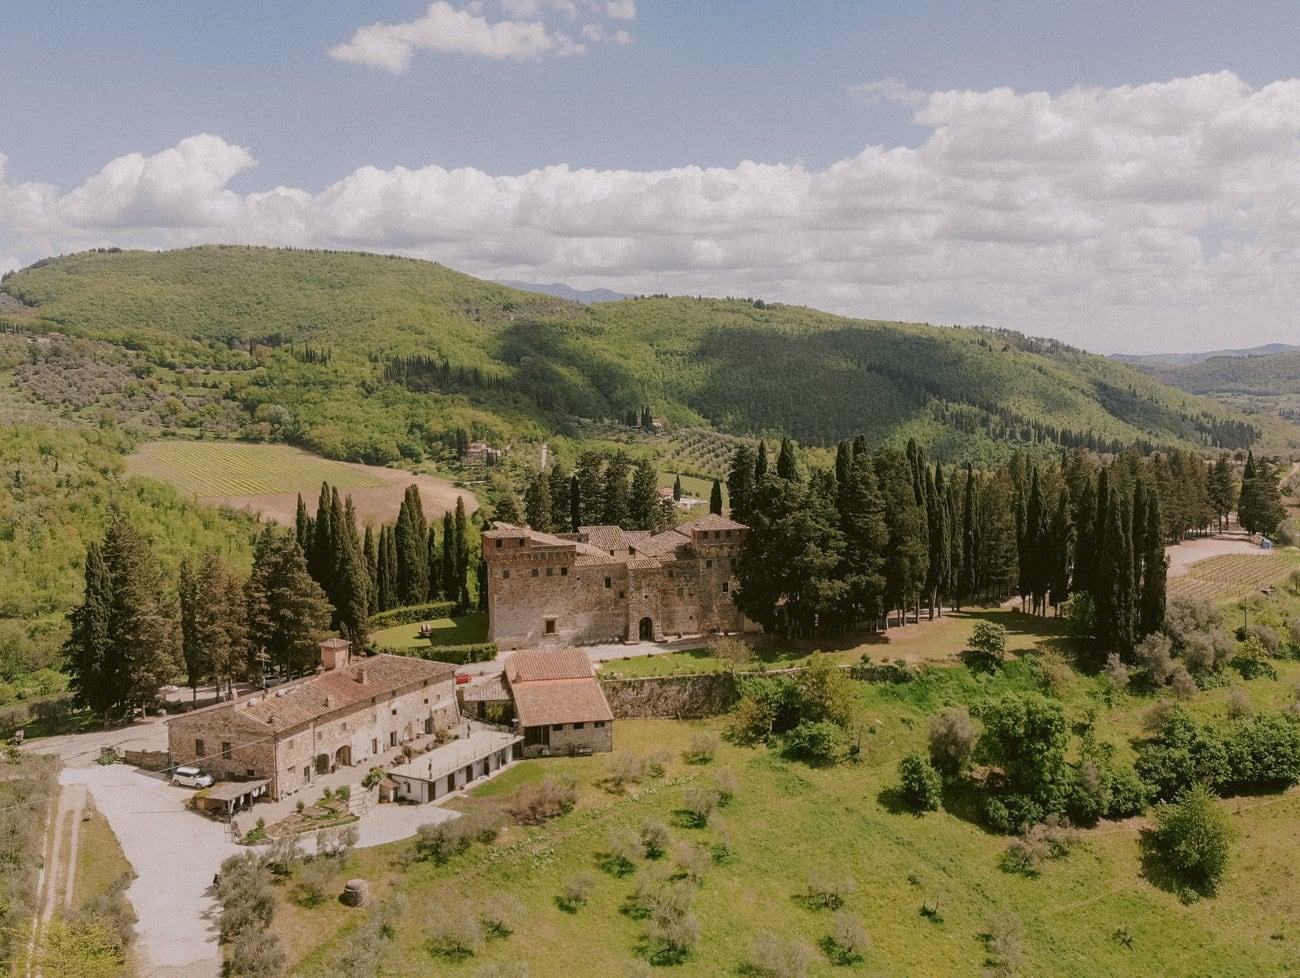 the Trebbio Castle from above